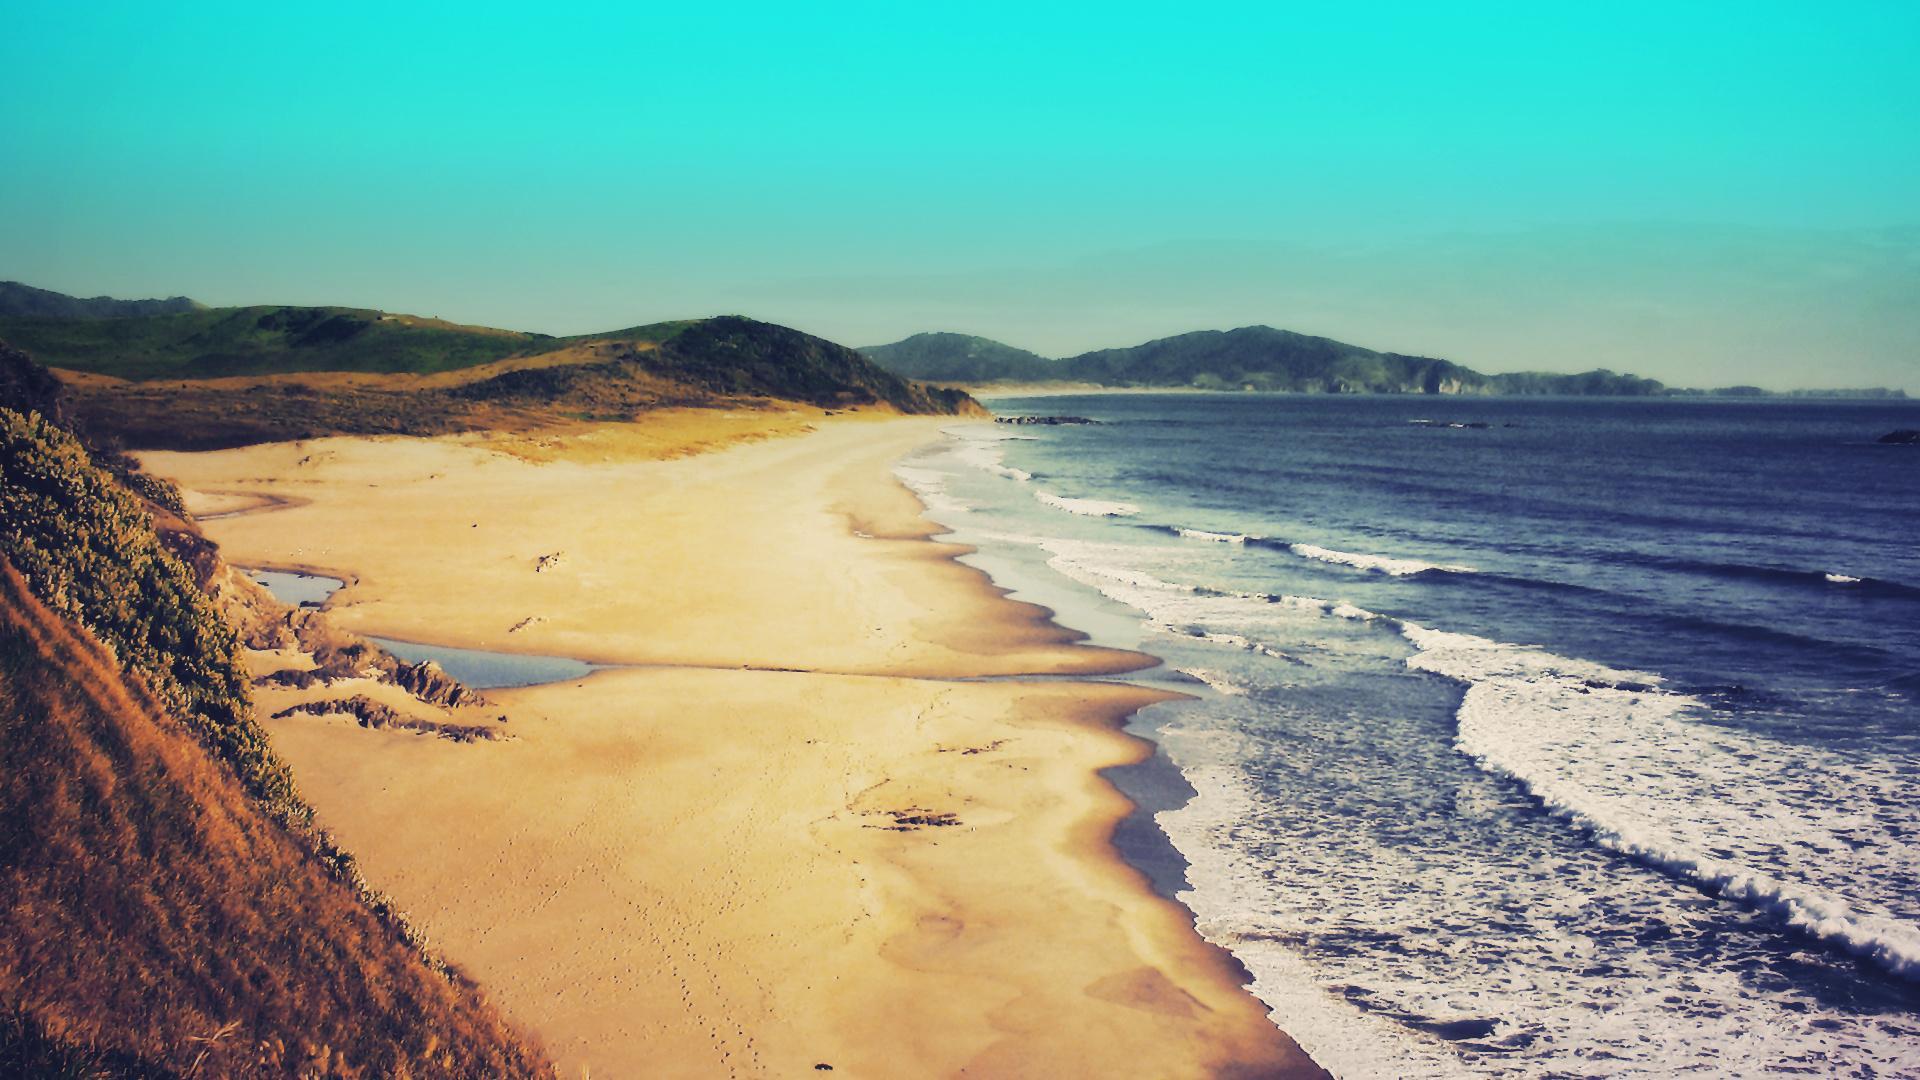 perus northern beaches died - HD1600×900